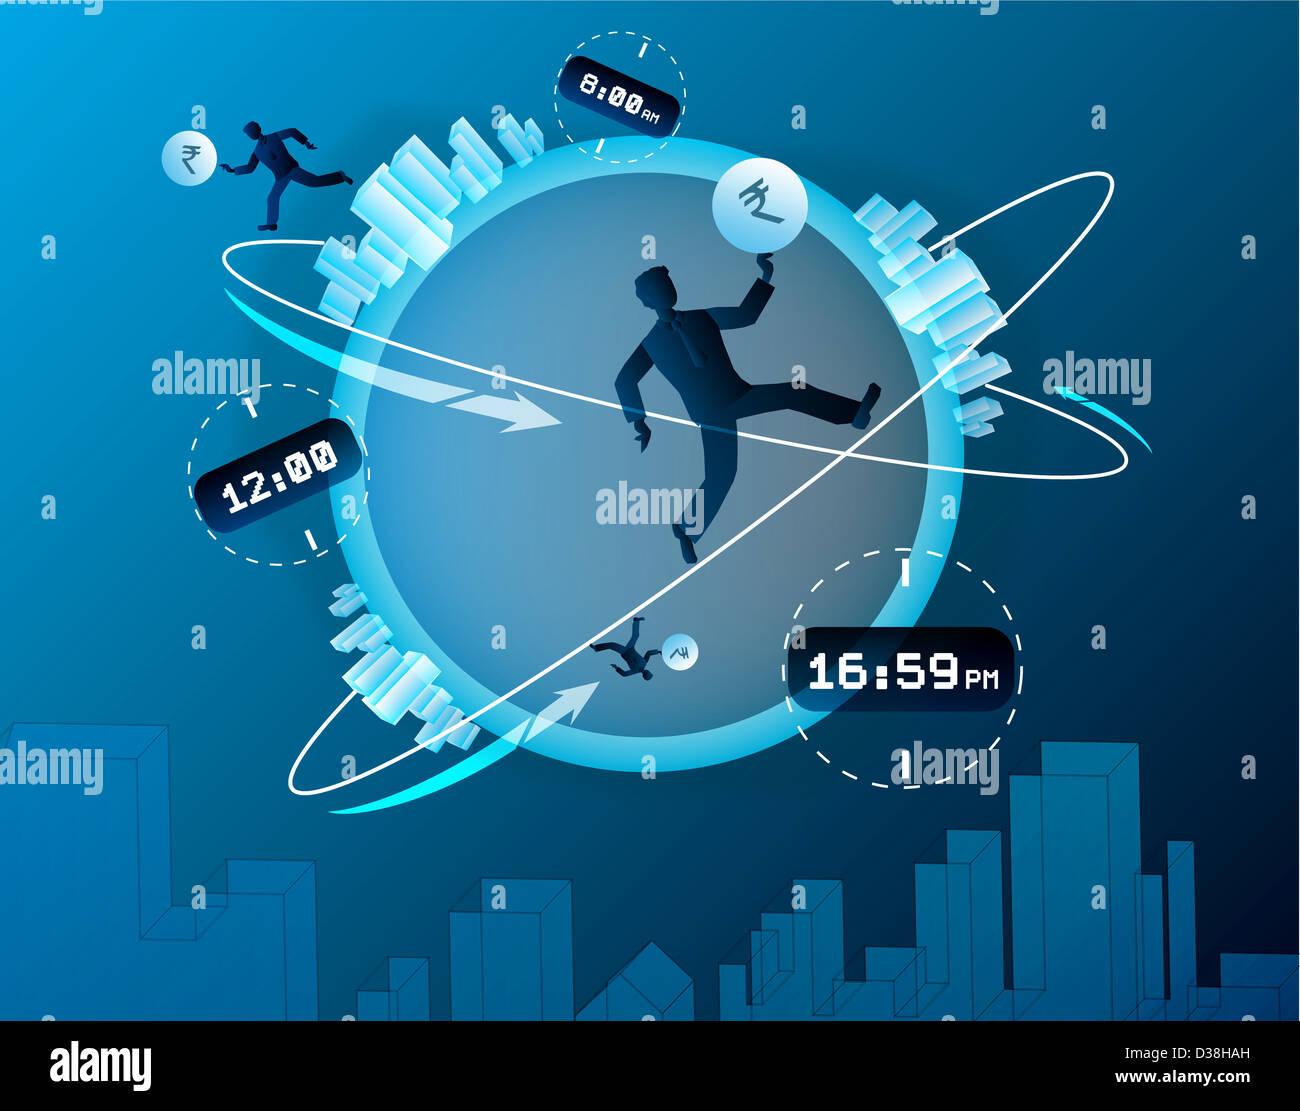 Illustration representing human race for development - Stock Image